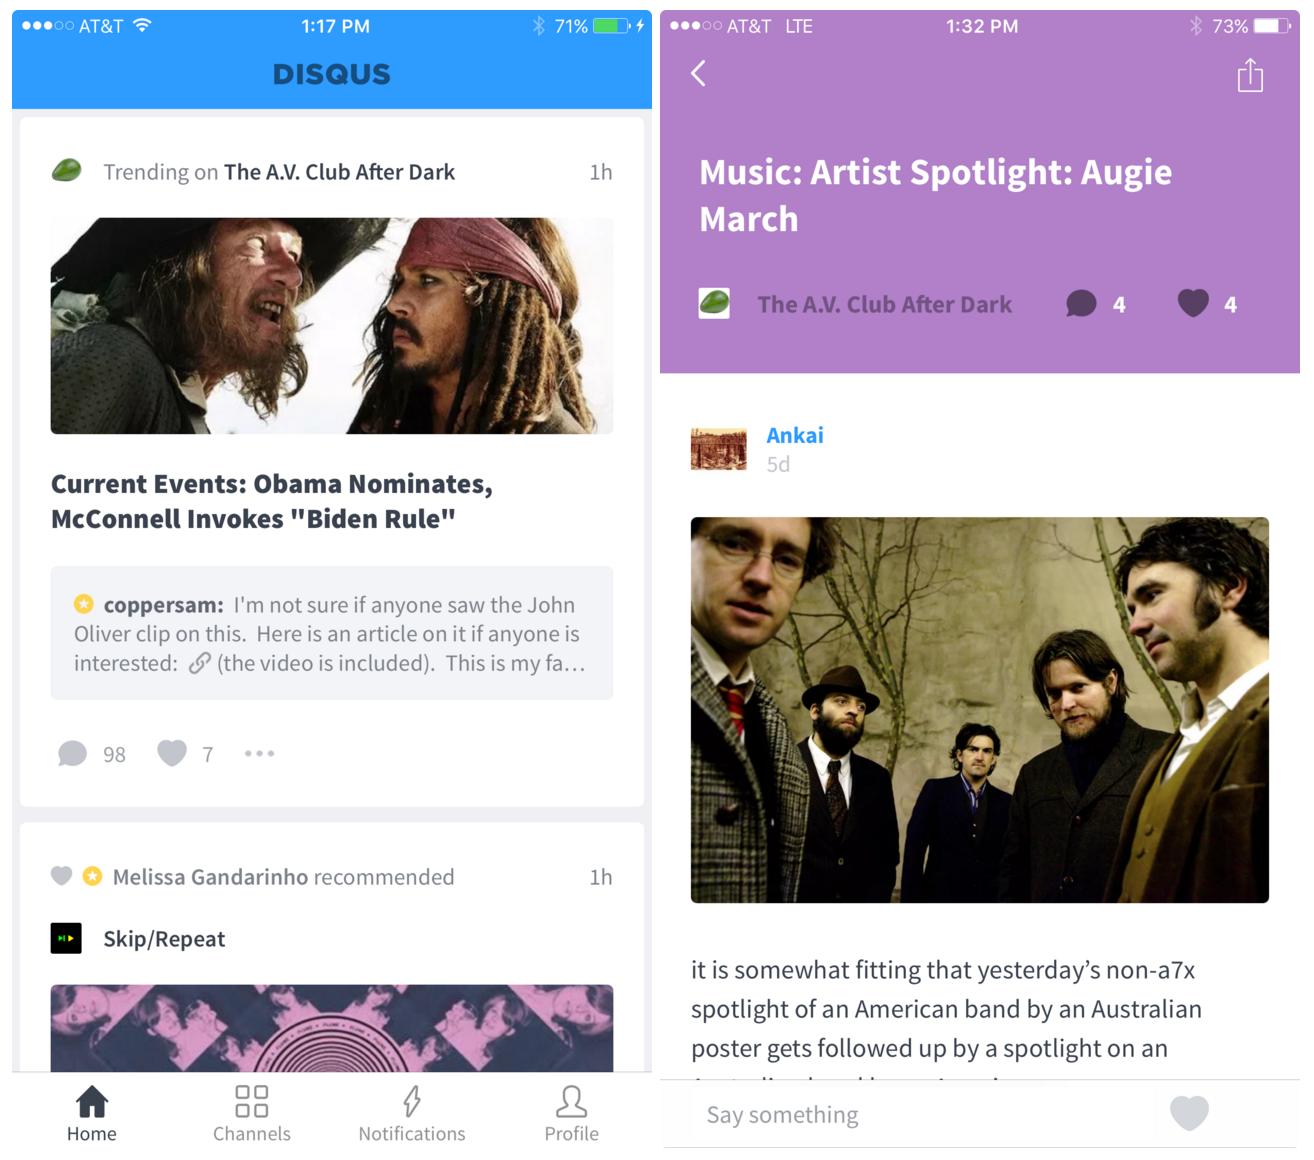 Disqus iOS App - Now Available